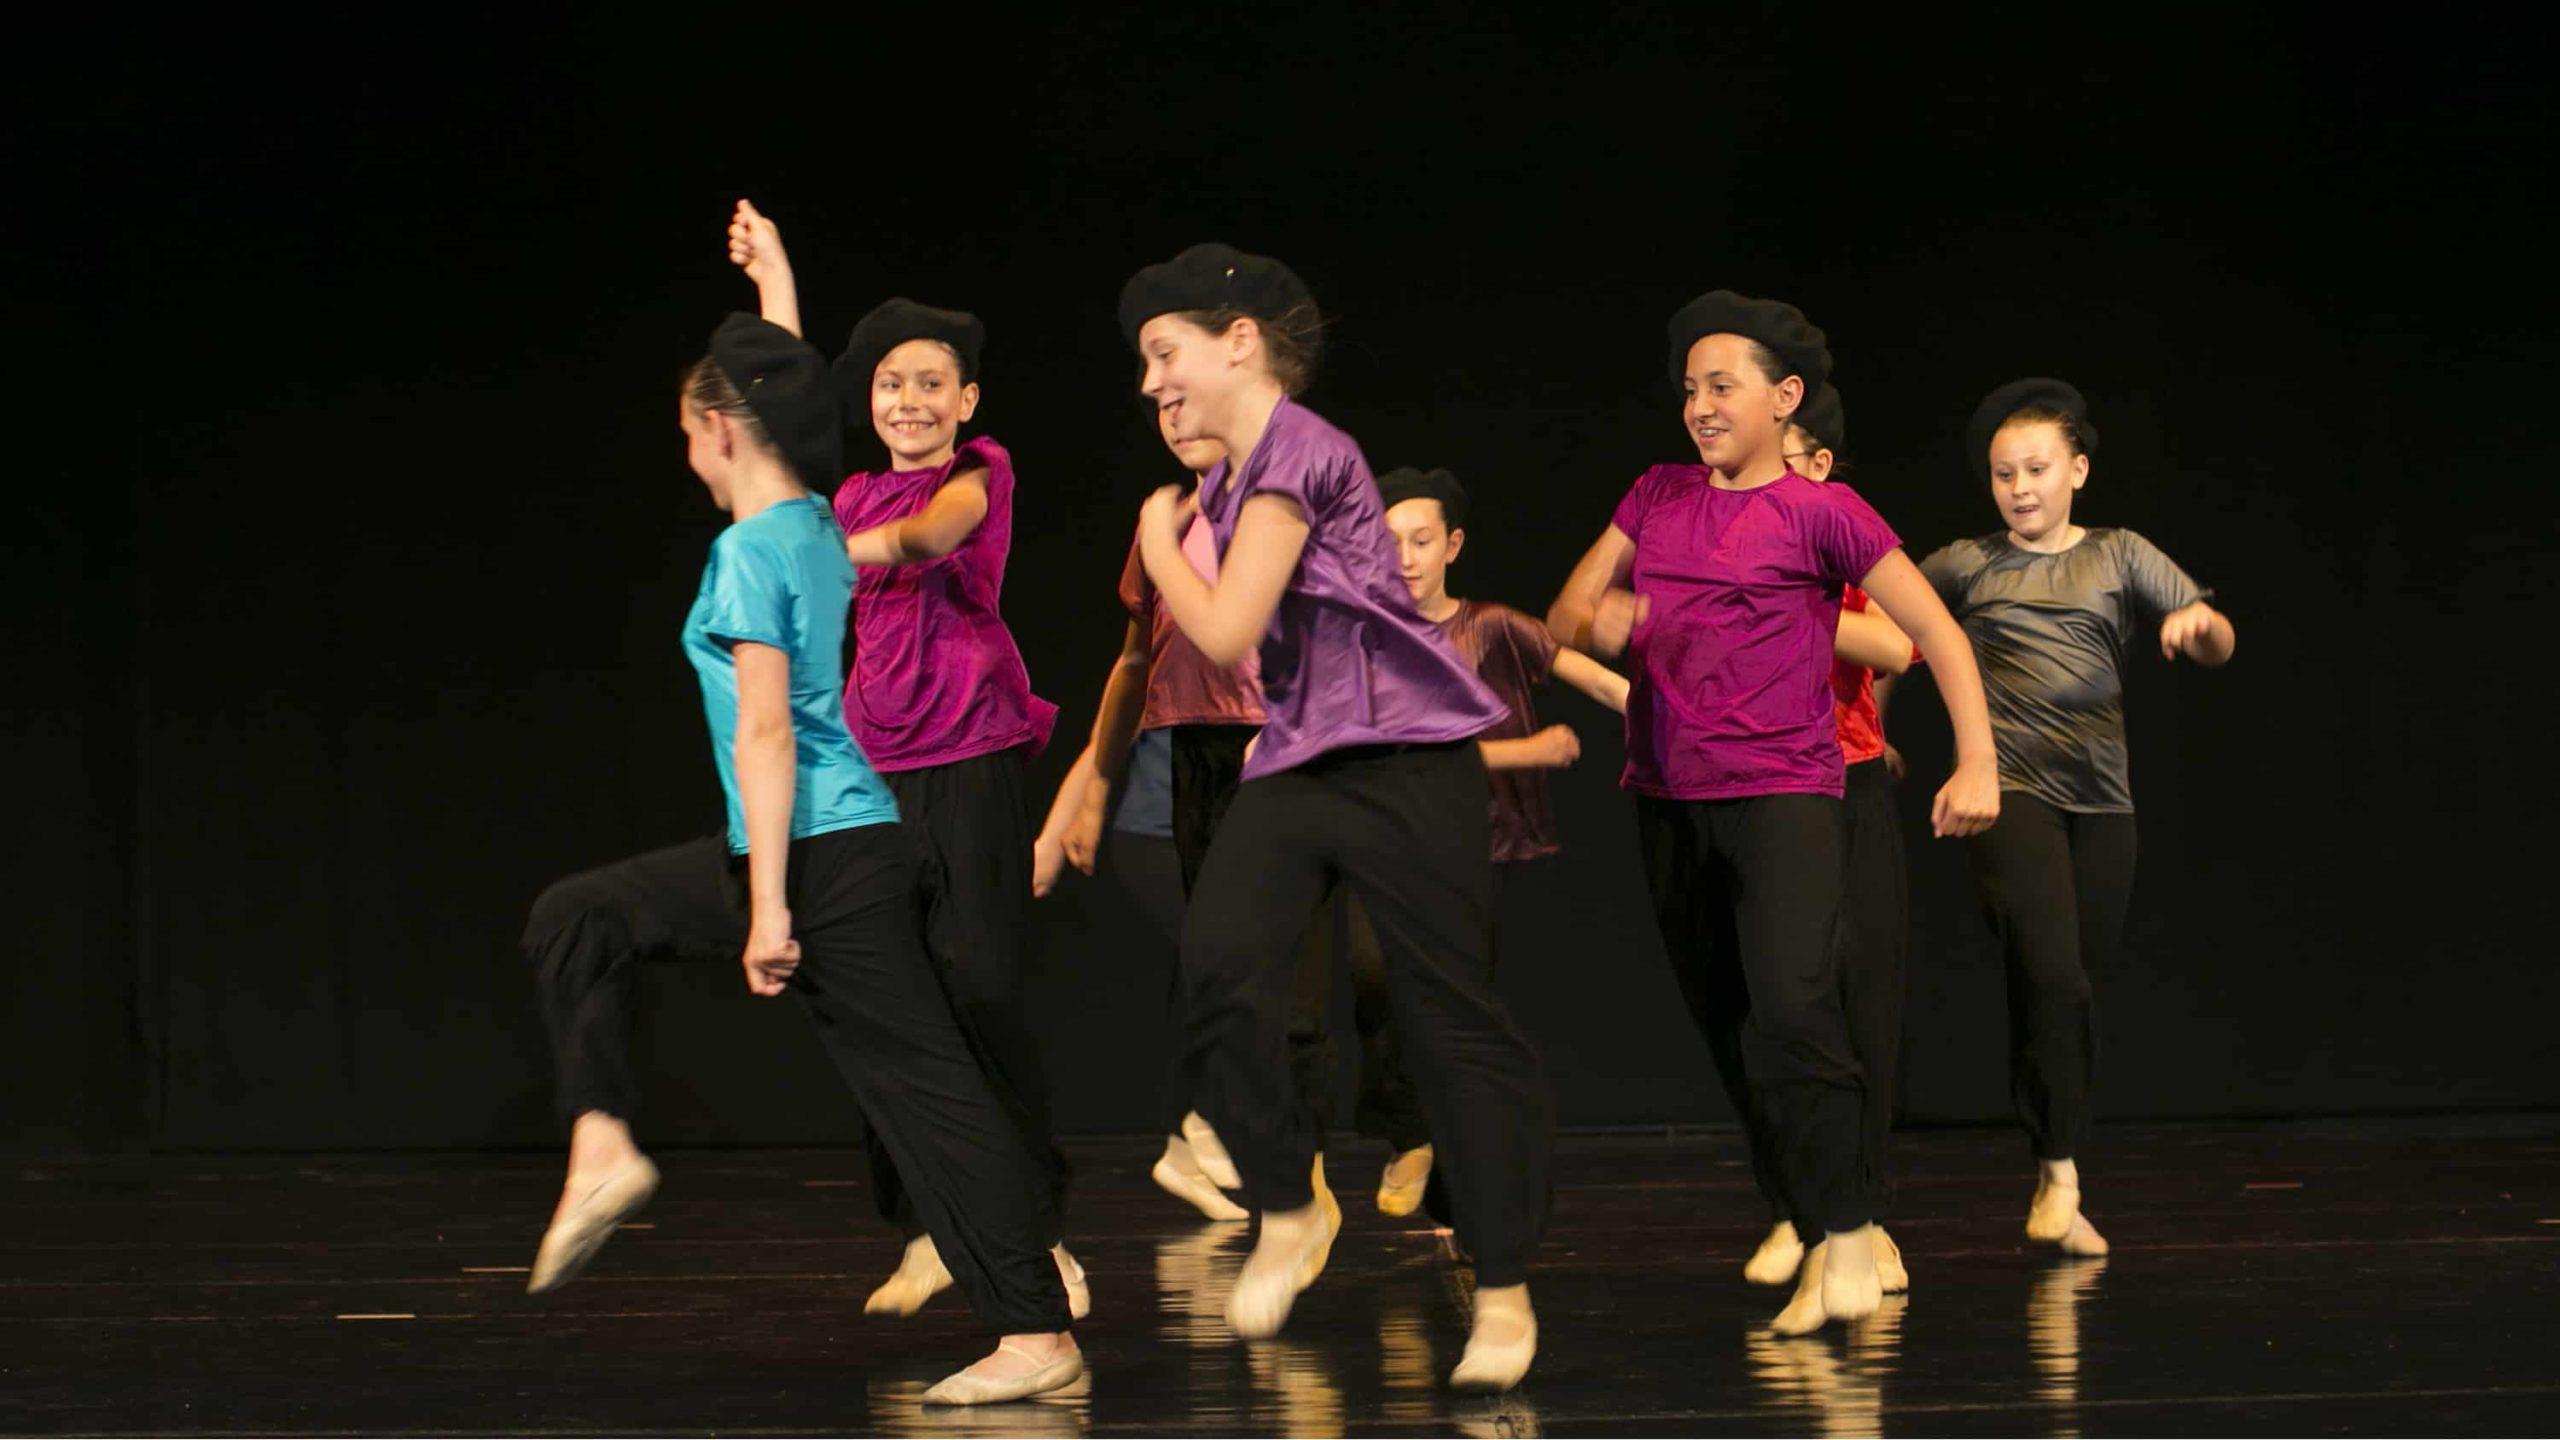 poetar-danzando-29@0.5x